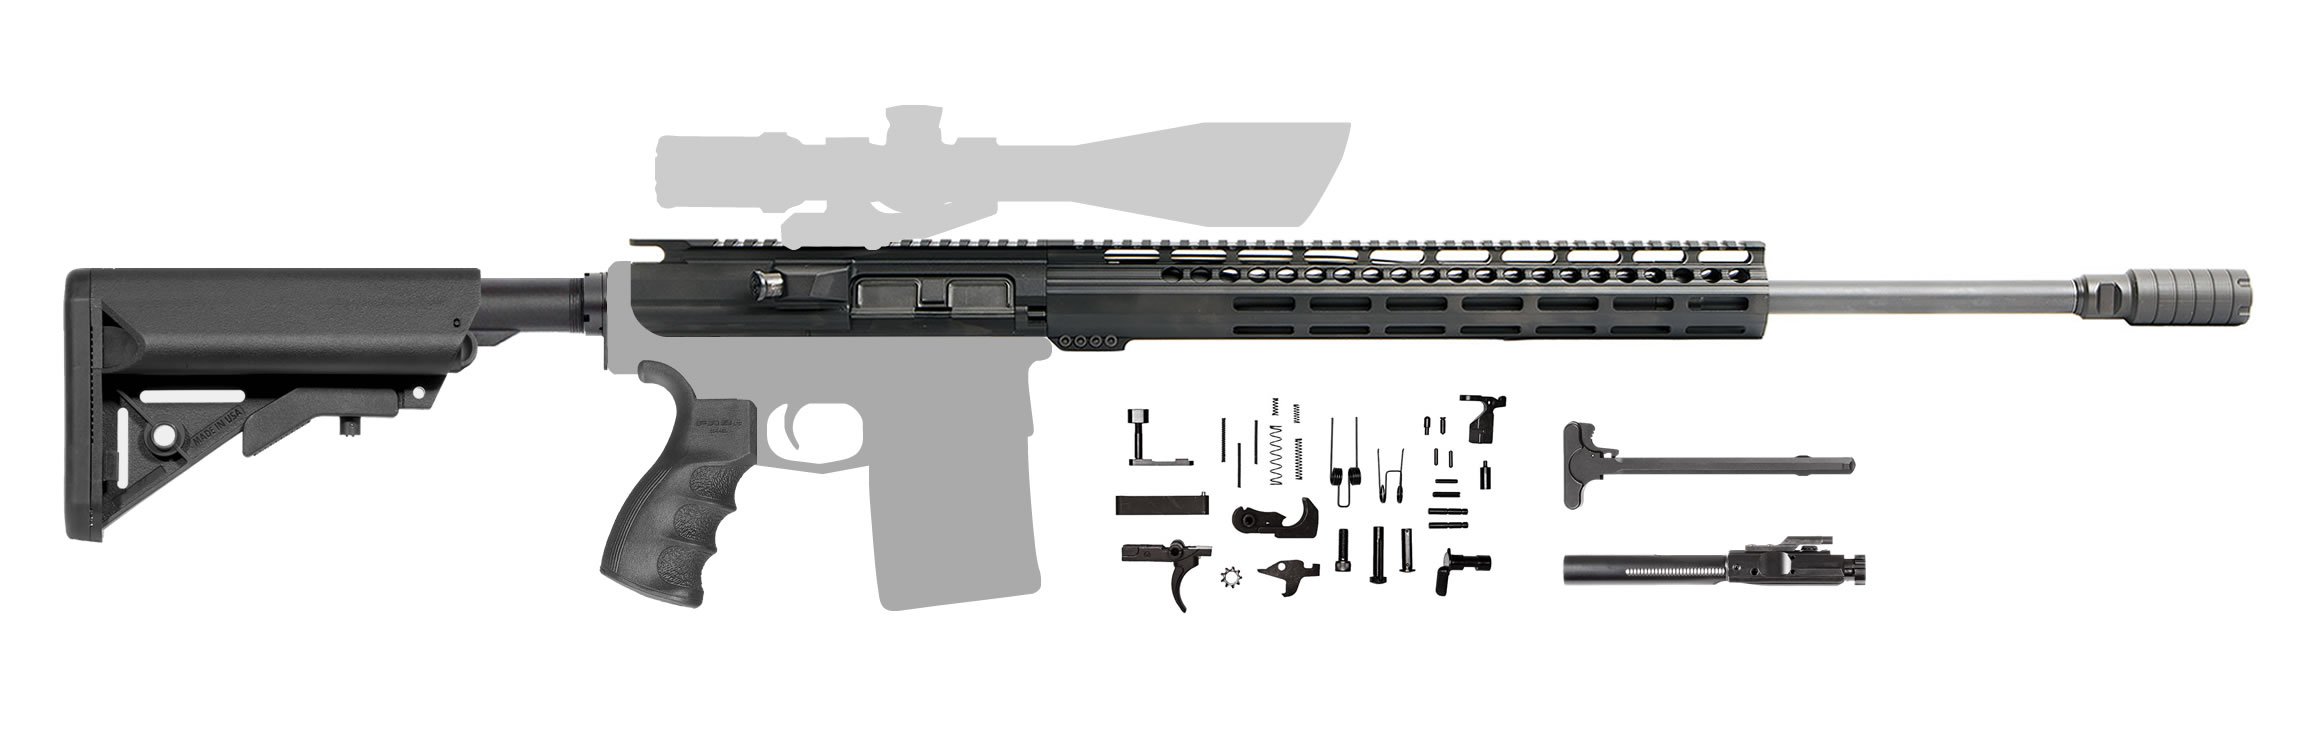 AR-10 Creedmoor Rifle Kit - 22